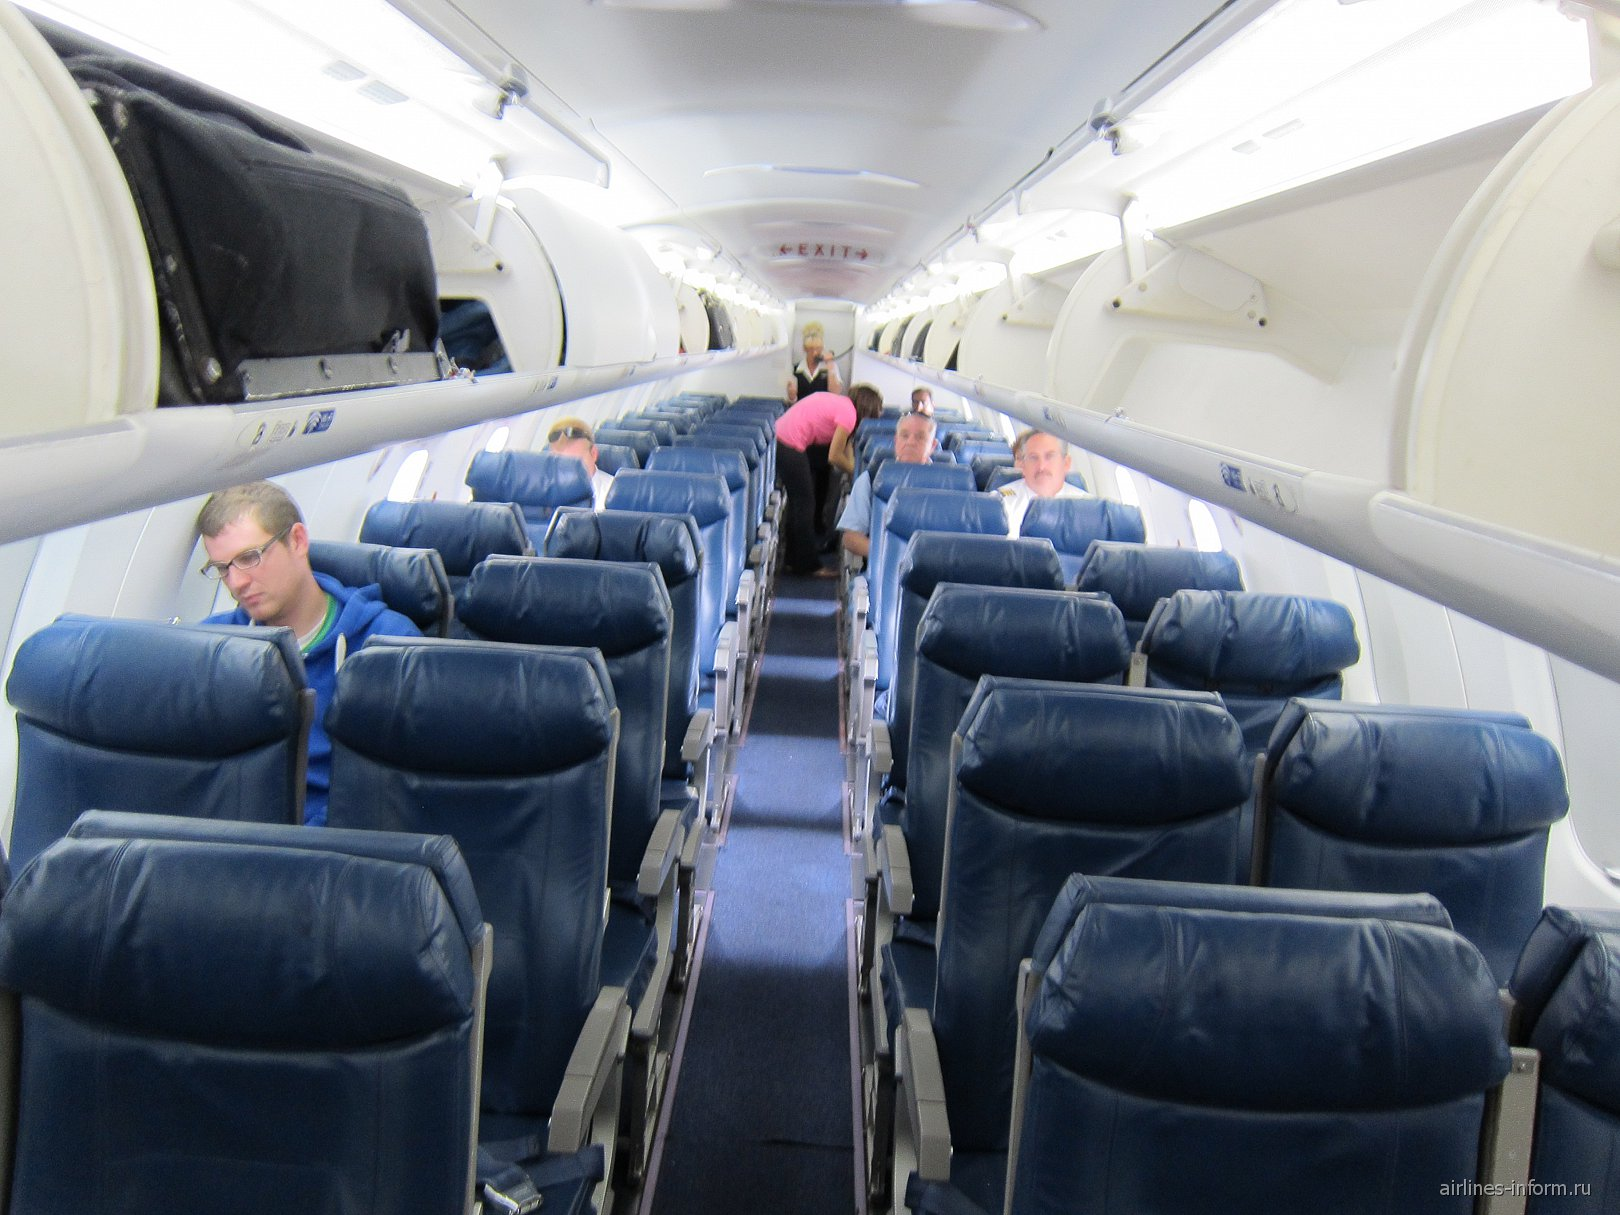 Салон самолета Самолет Bombardier CRJ900 региональной сети Delta Connection